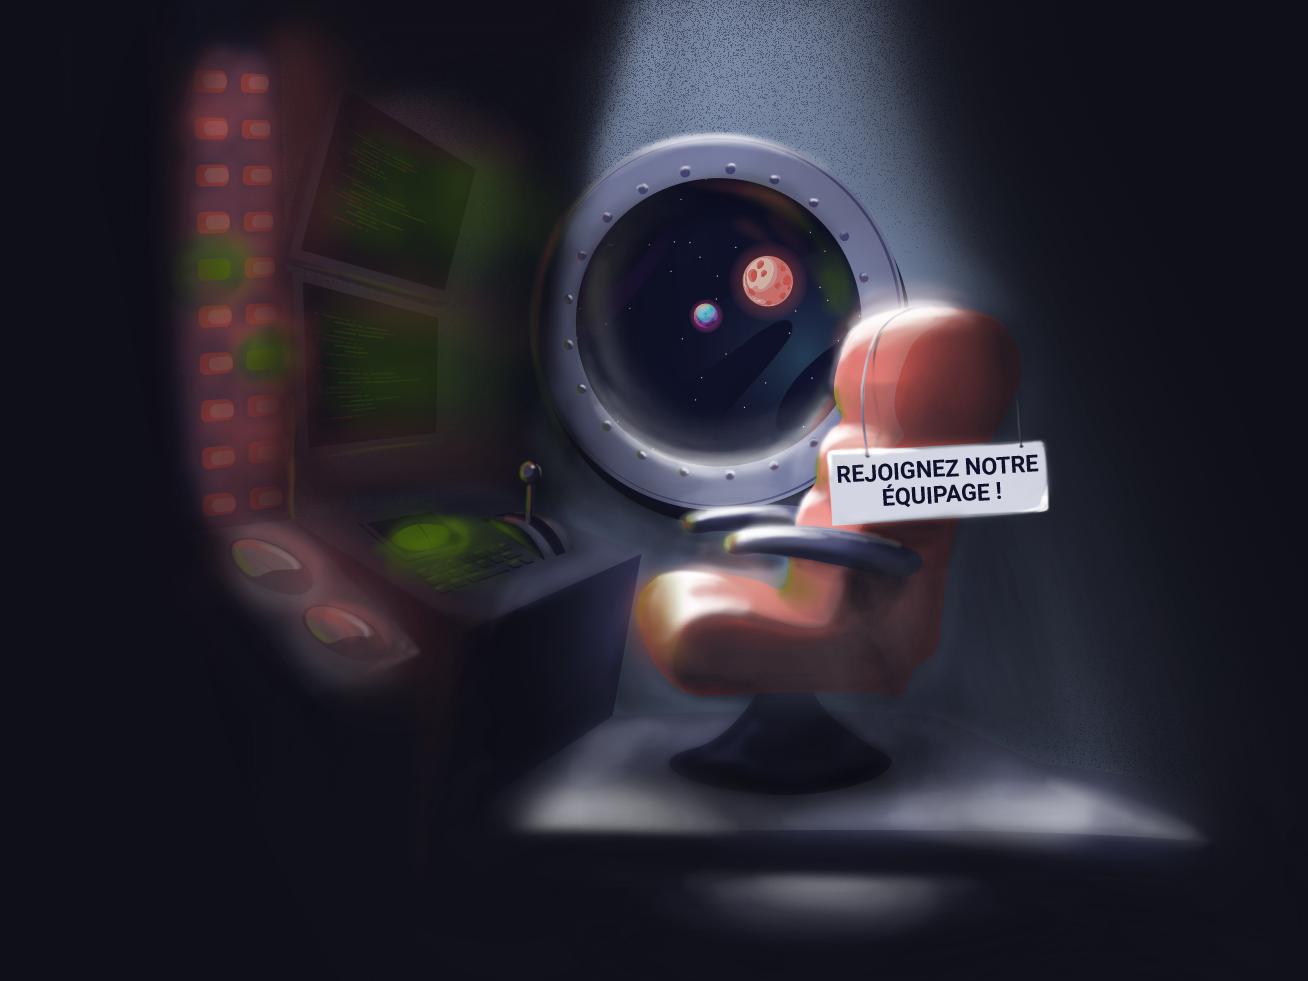 Hiring illustration - French Digital Agency hire hiring lighting painting website web beaver vector spaceship space rocket illustration design castornaute cartoon